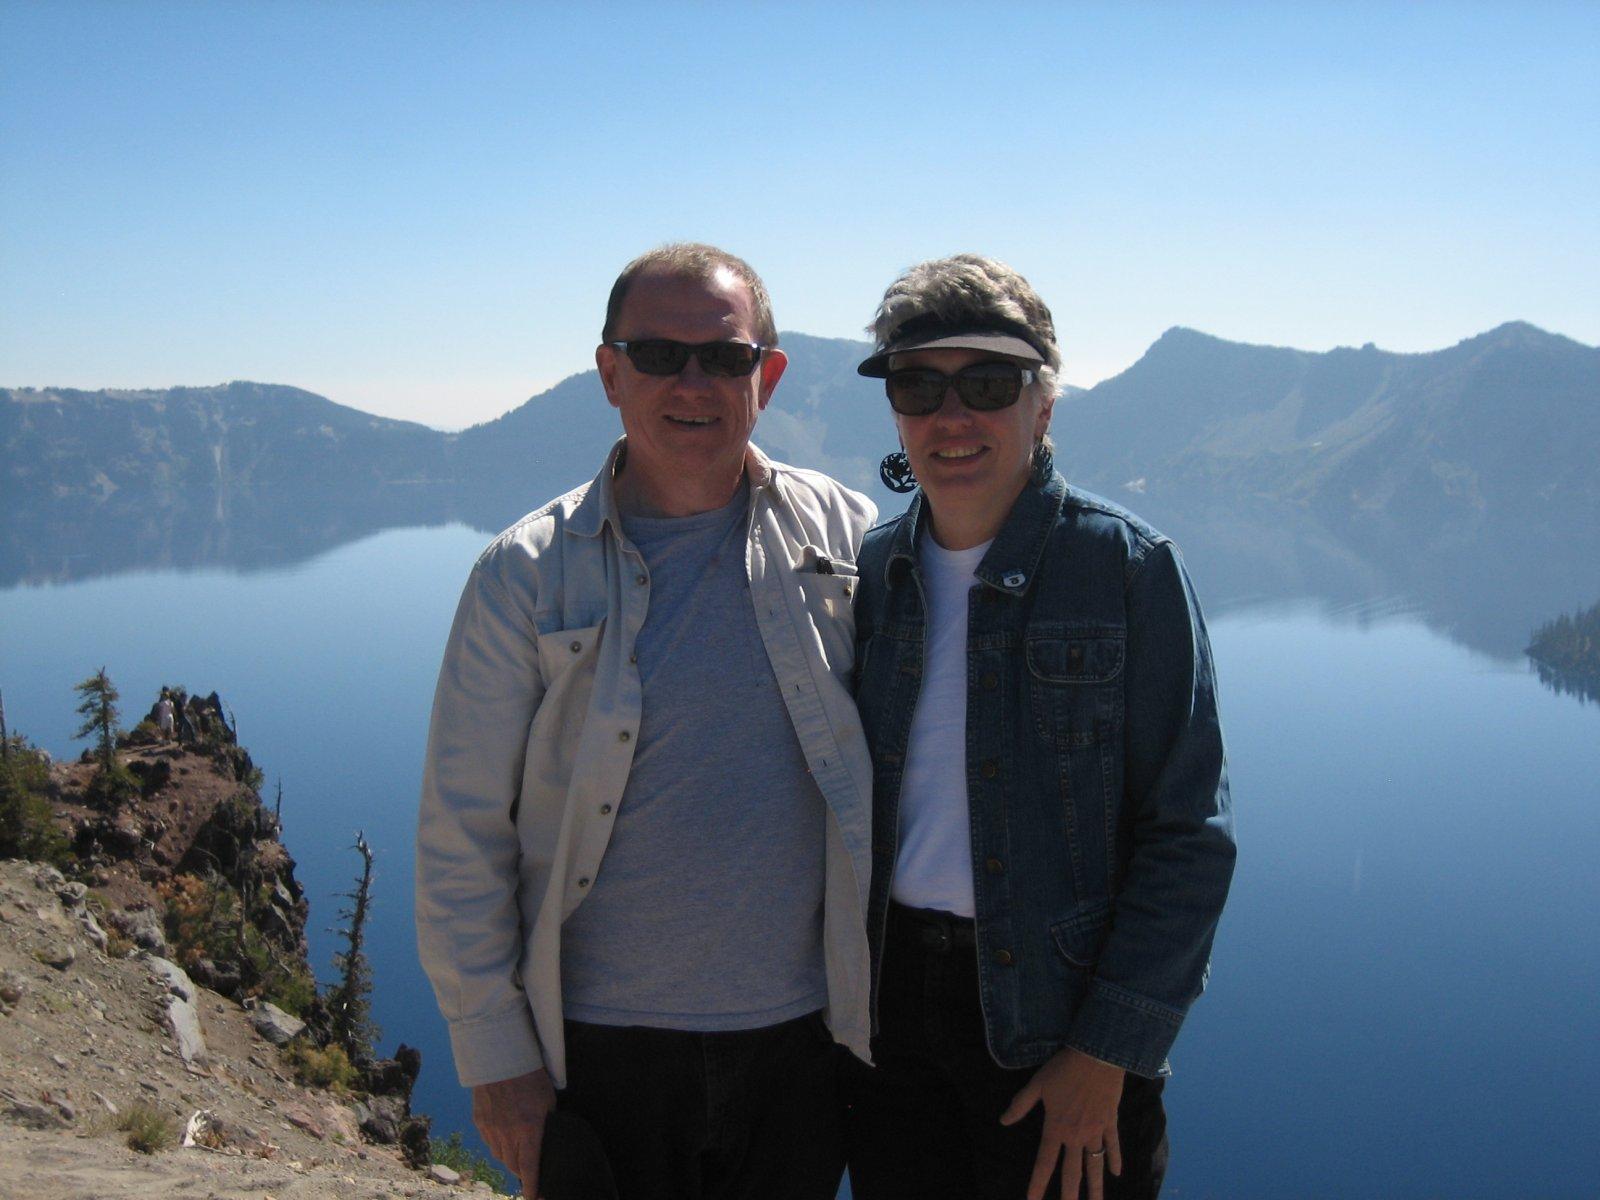 Click image for larger version  Name:2012 09 26 Eric Ginny La Juene at Crater Lake Oregon.jpg Views:35 Size:184.9 KB ID:37218